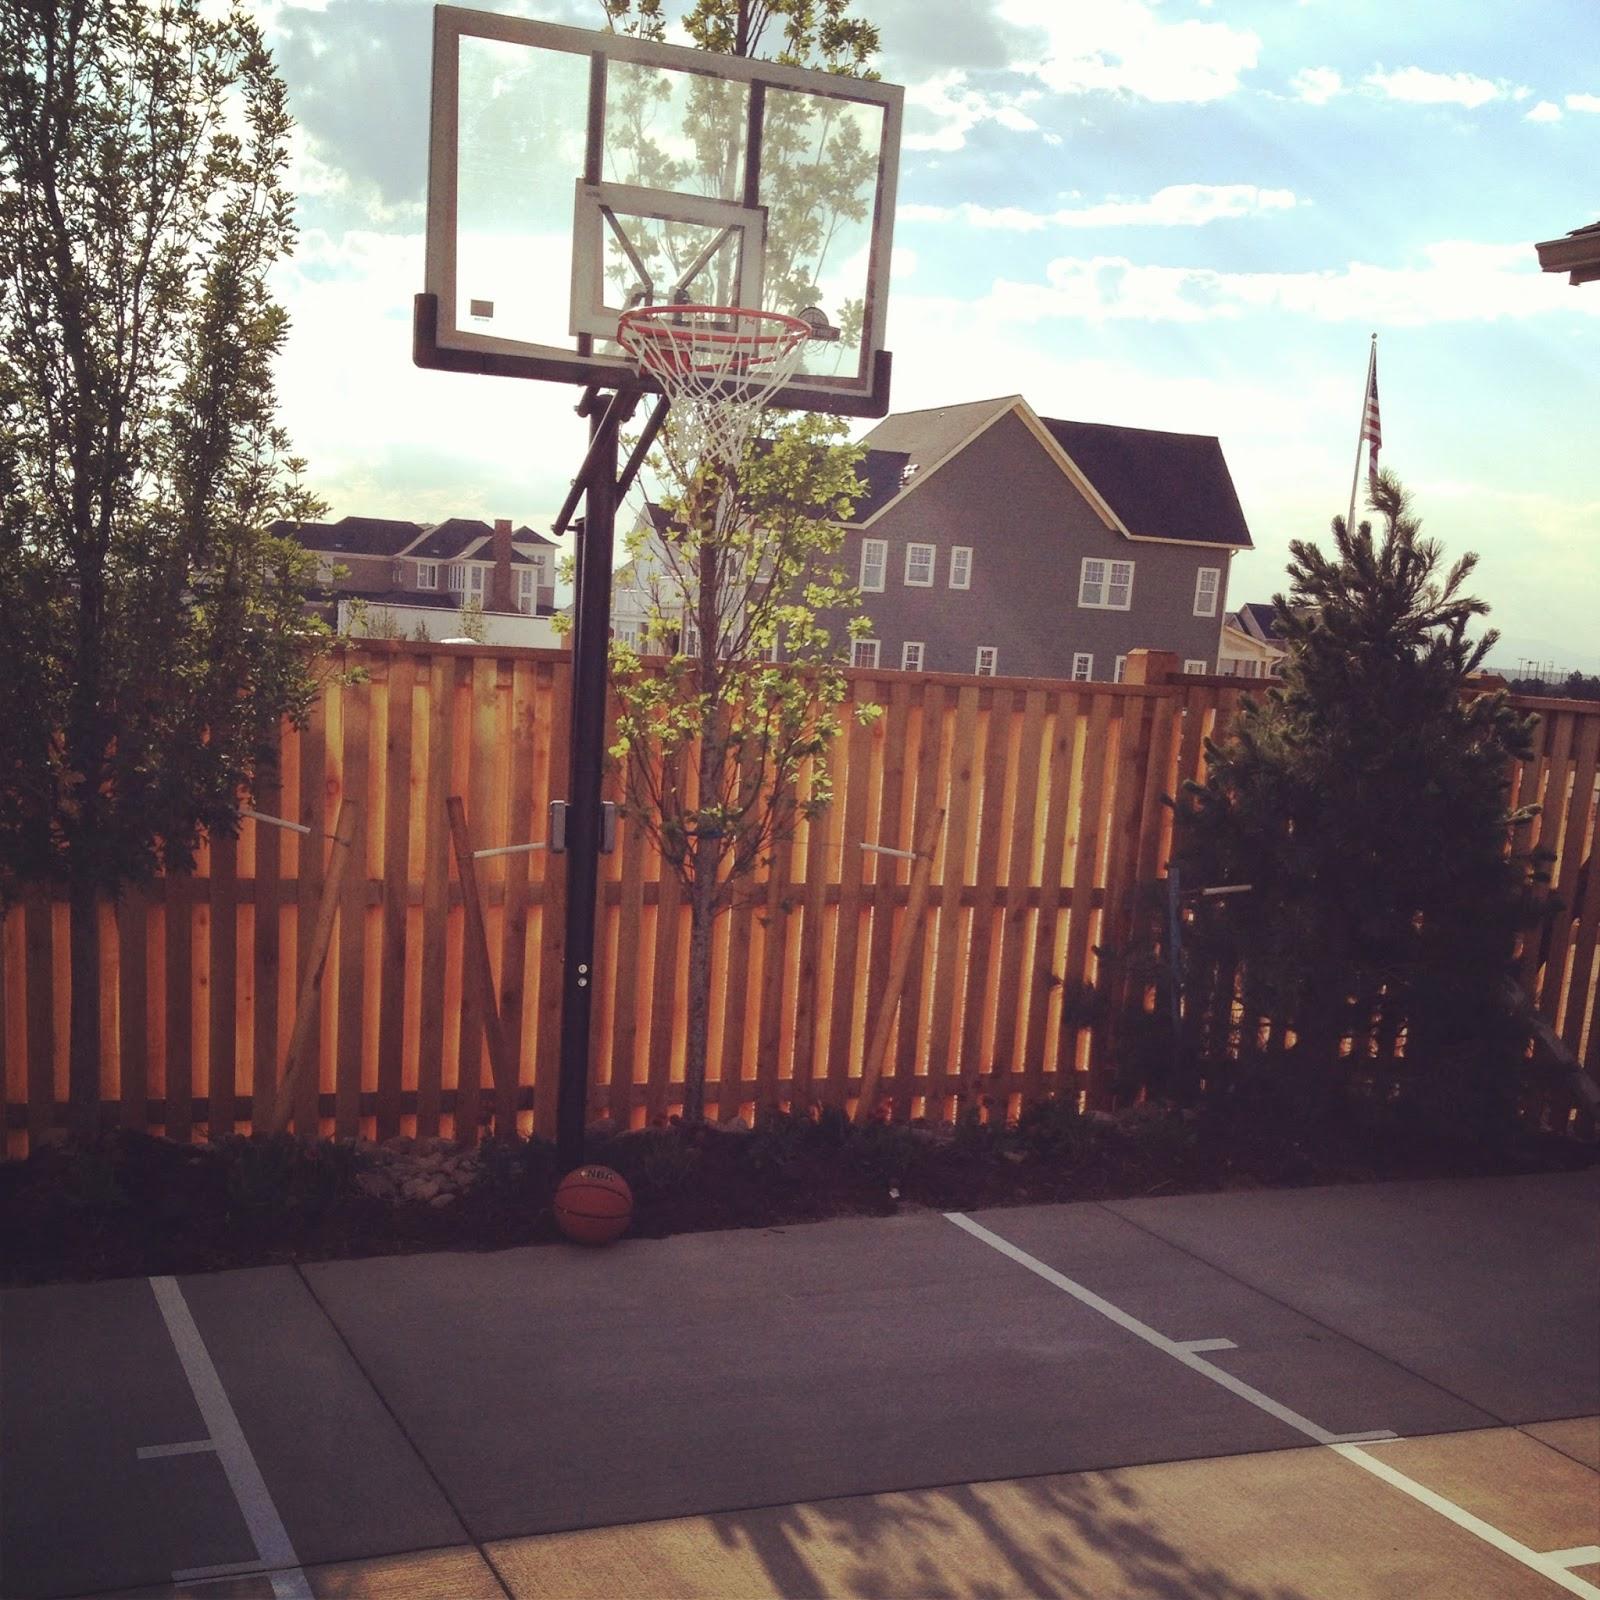 Bedroom basketball hoop basketball scores for Bedroom basketball hoop